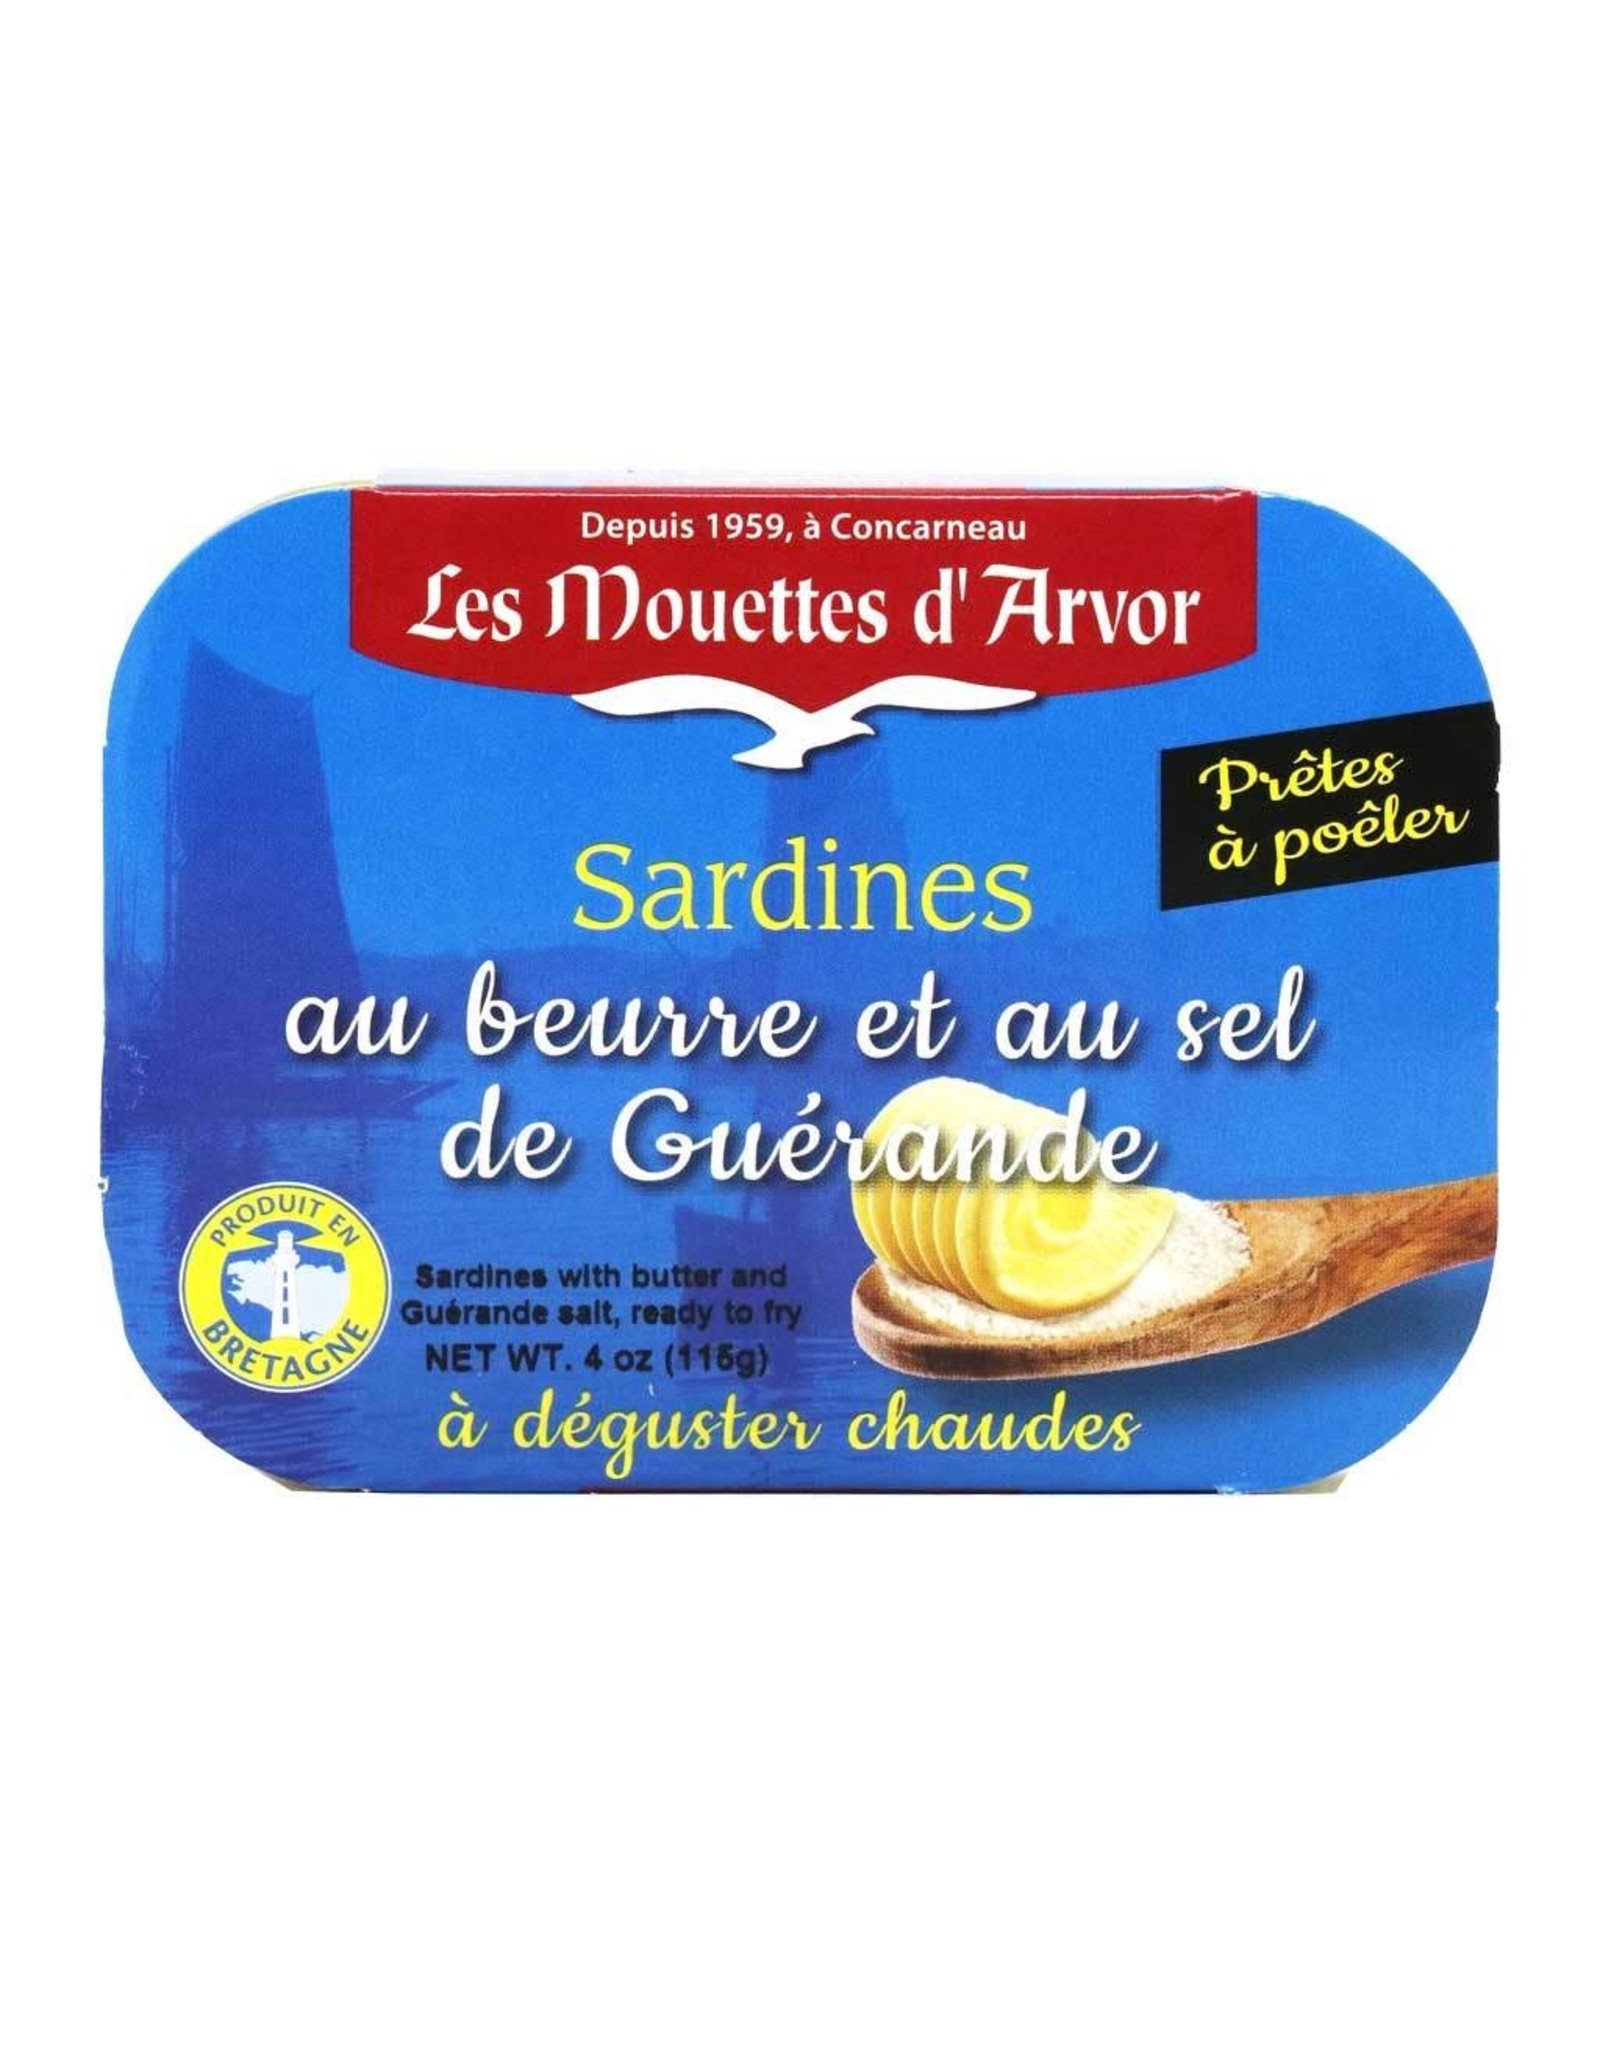 Mouettes d'arvor Mouettes d'Arvor Sardines with Butter and Sea Salt